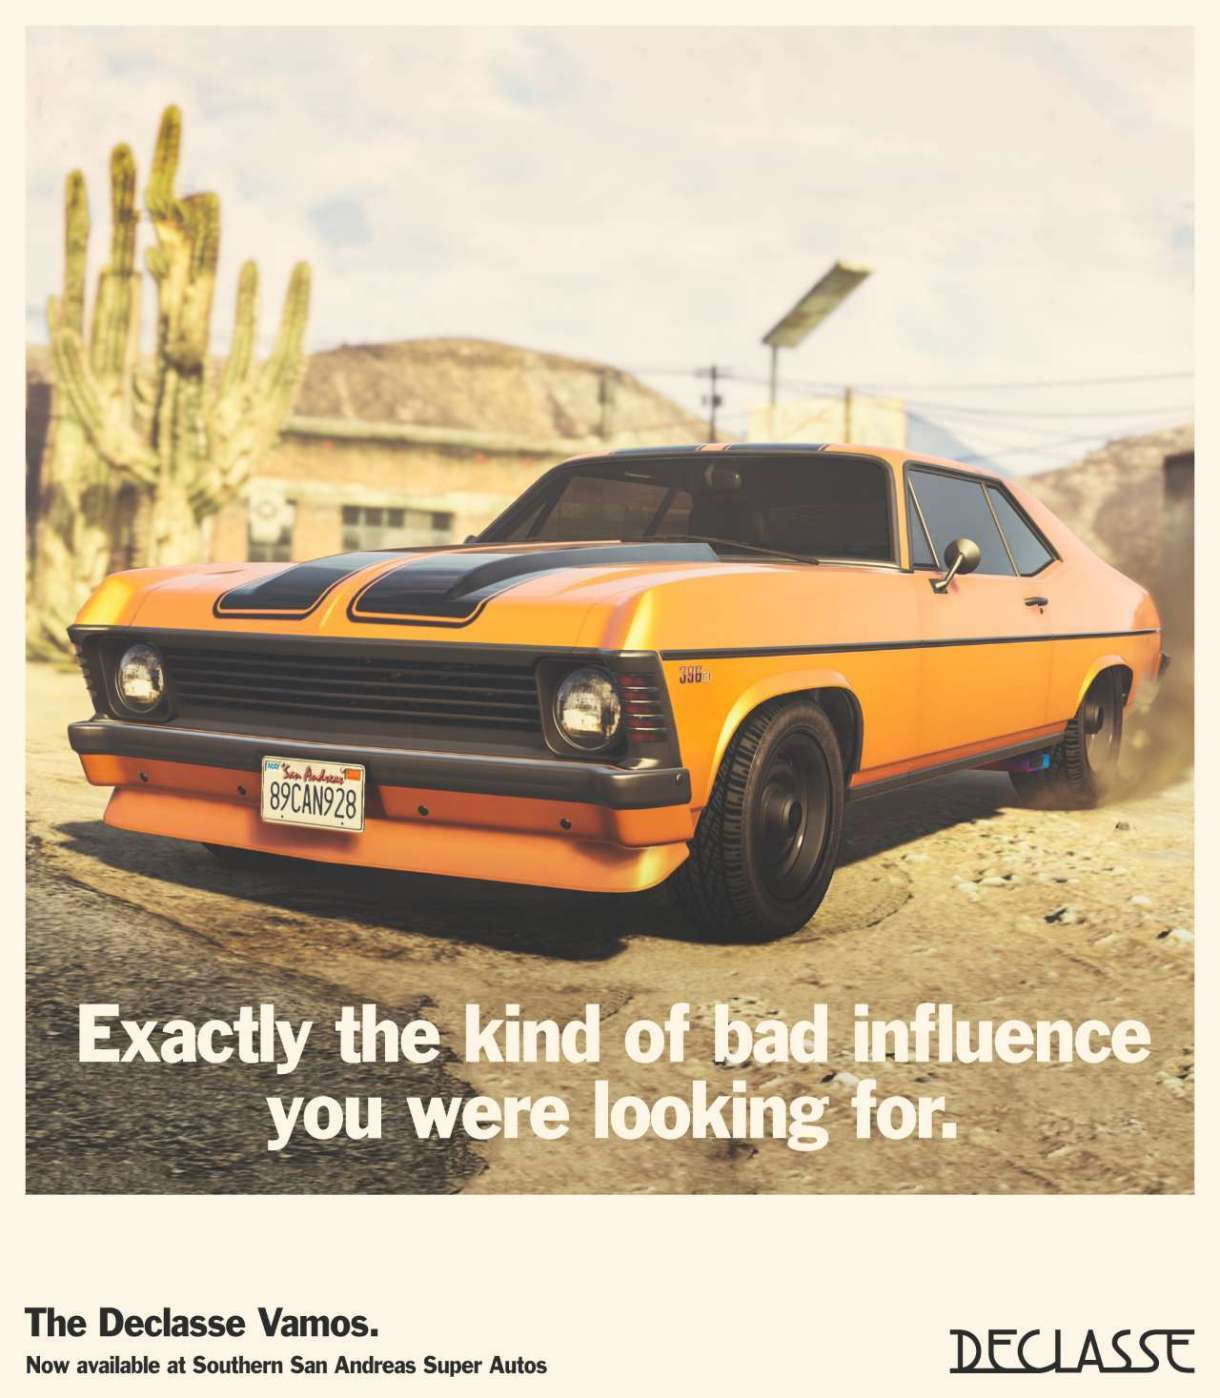 Grand Theft Auto Online Rockstar Games Declasse Vamos